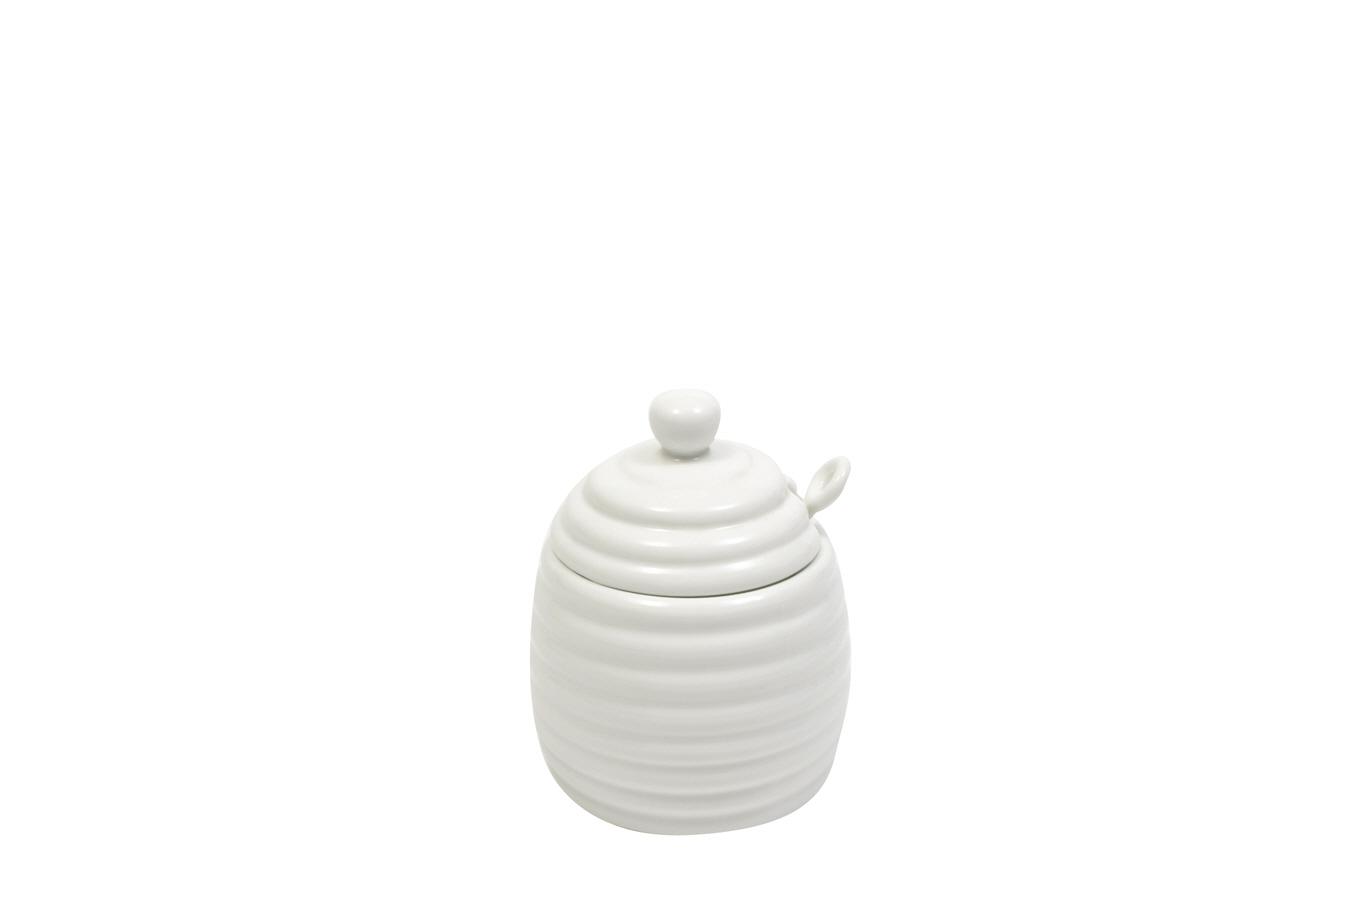 Porcelánová Nádobka na med se lžičkou White Basics - Maxwell&Williams